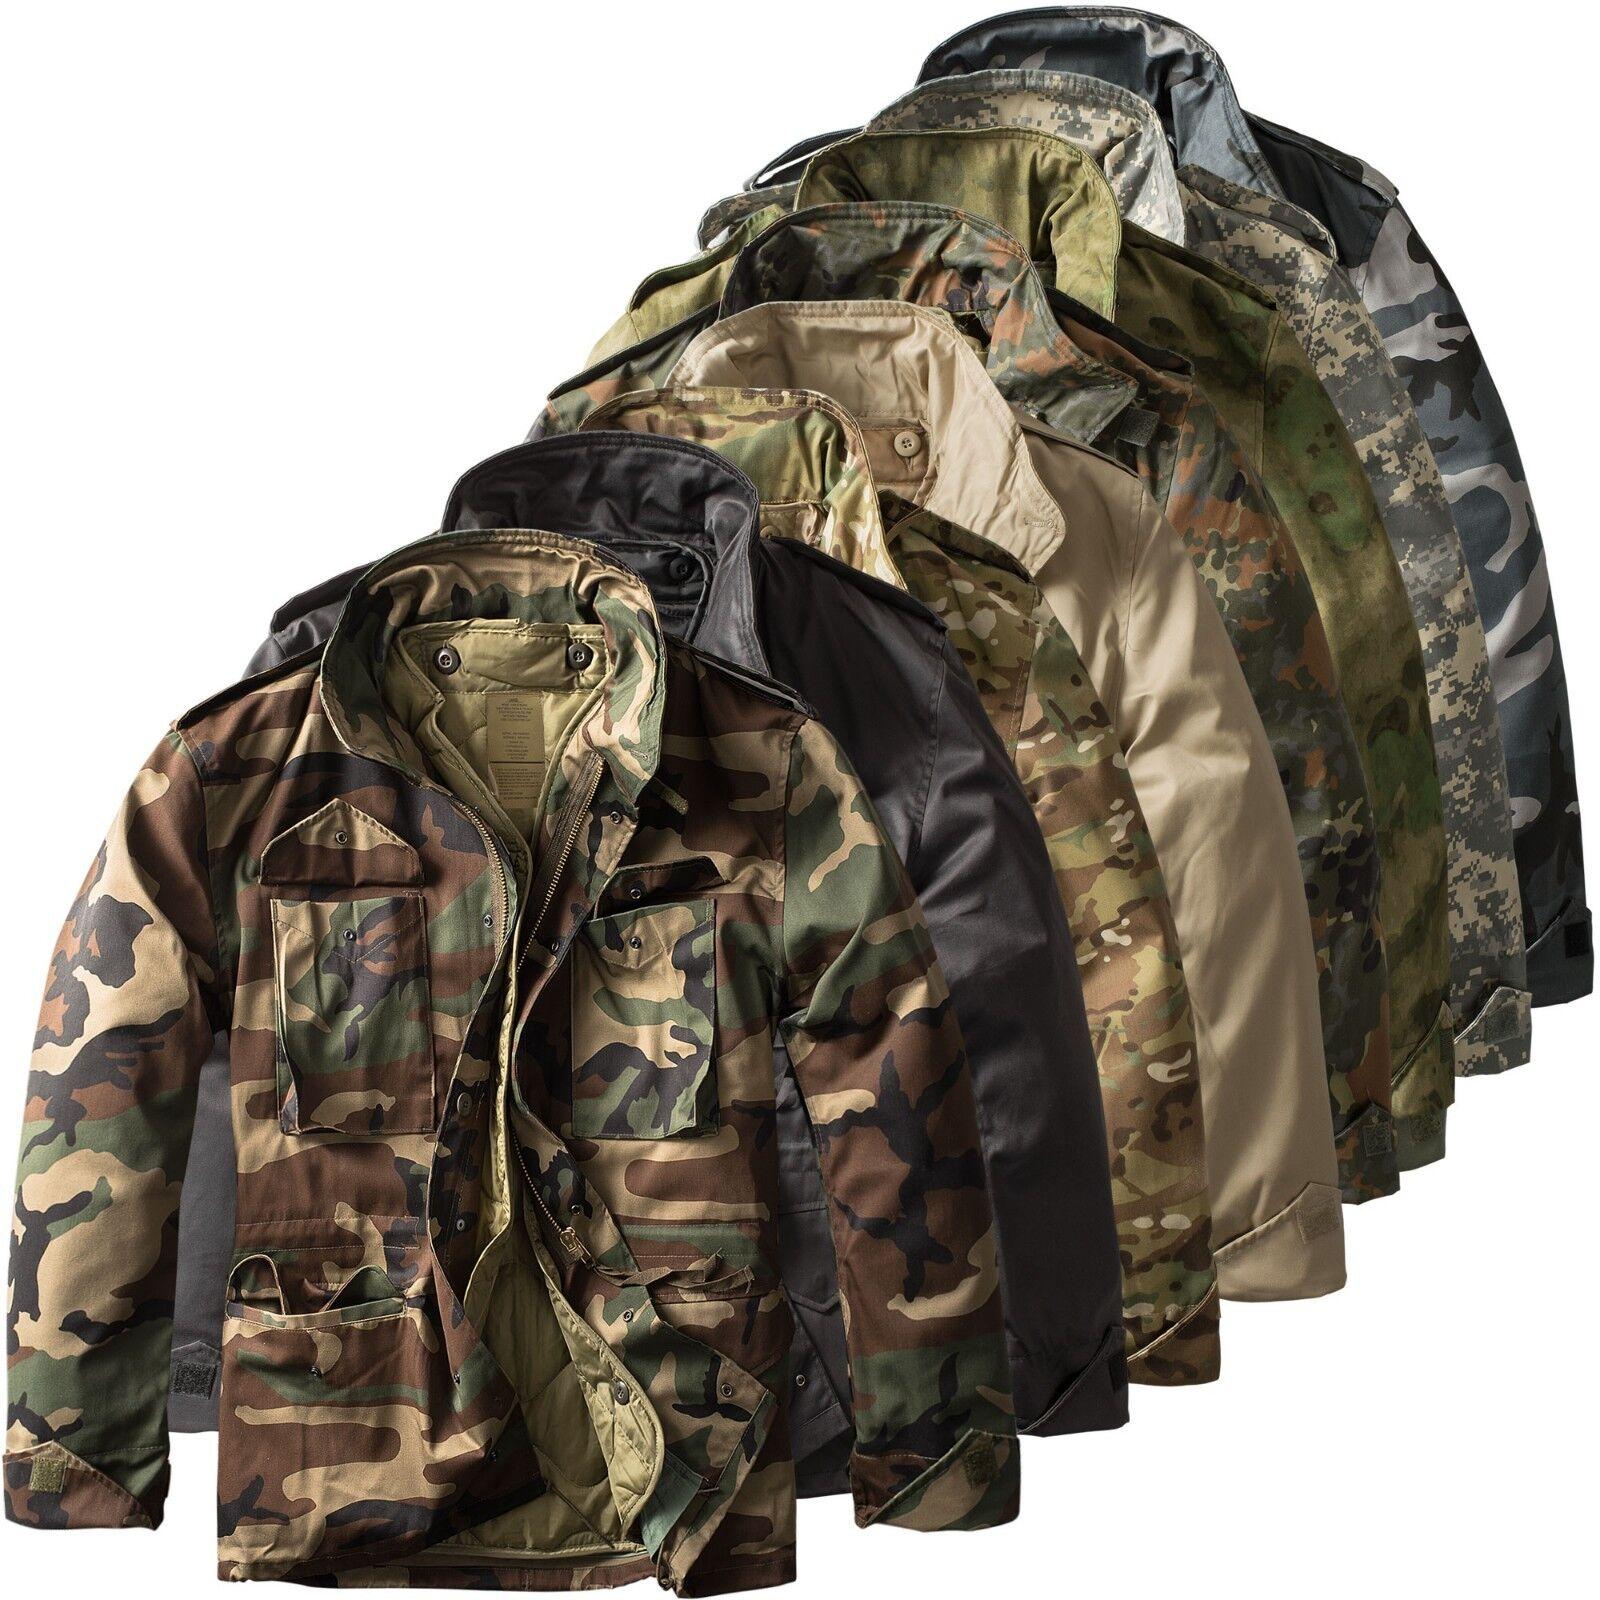 M65 Fieldjacket flecktarn S-5XL mit Futter Tarnjacke Feldjacke Jagdjacke Parka Bekleidung Jacken & Mäntel